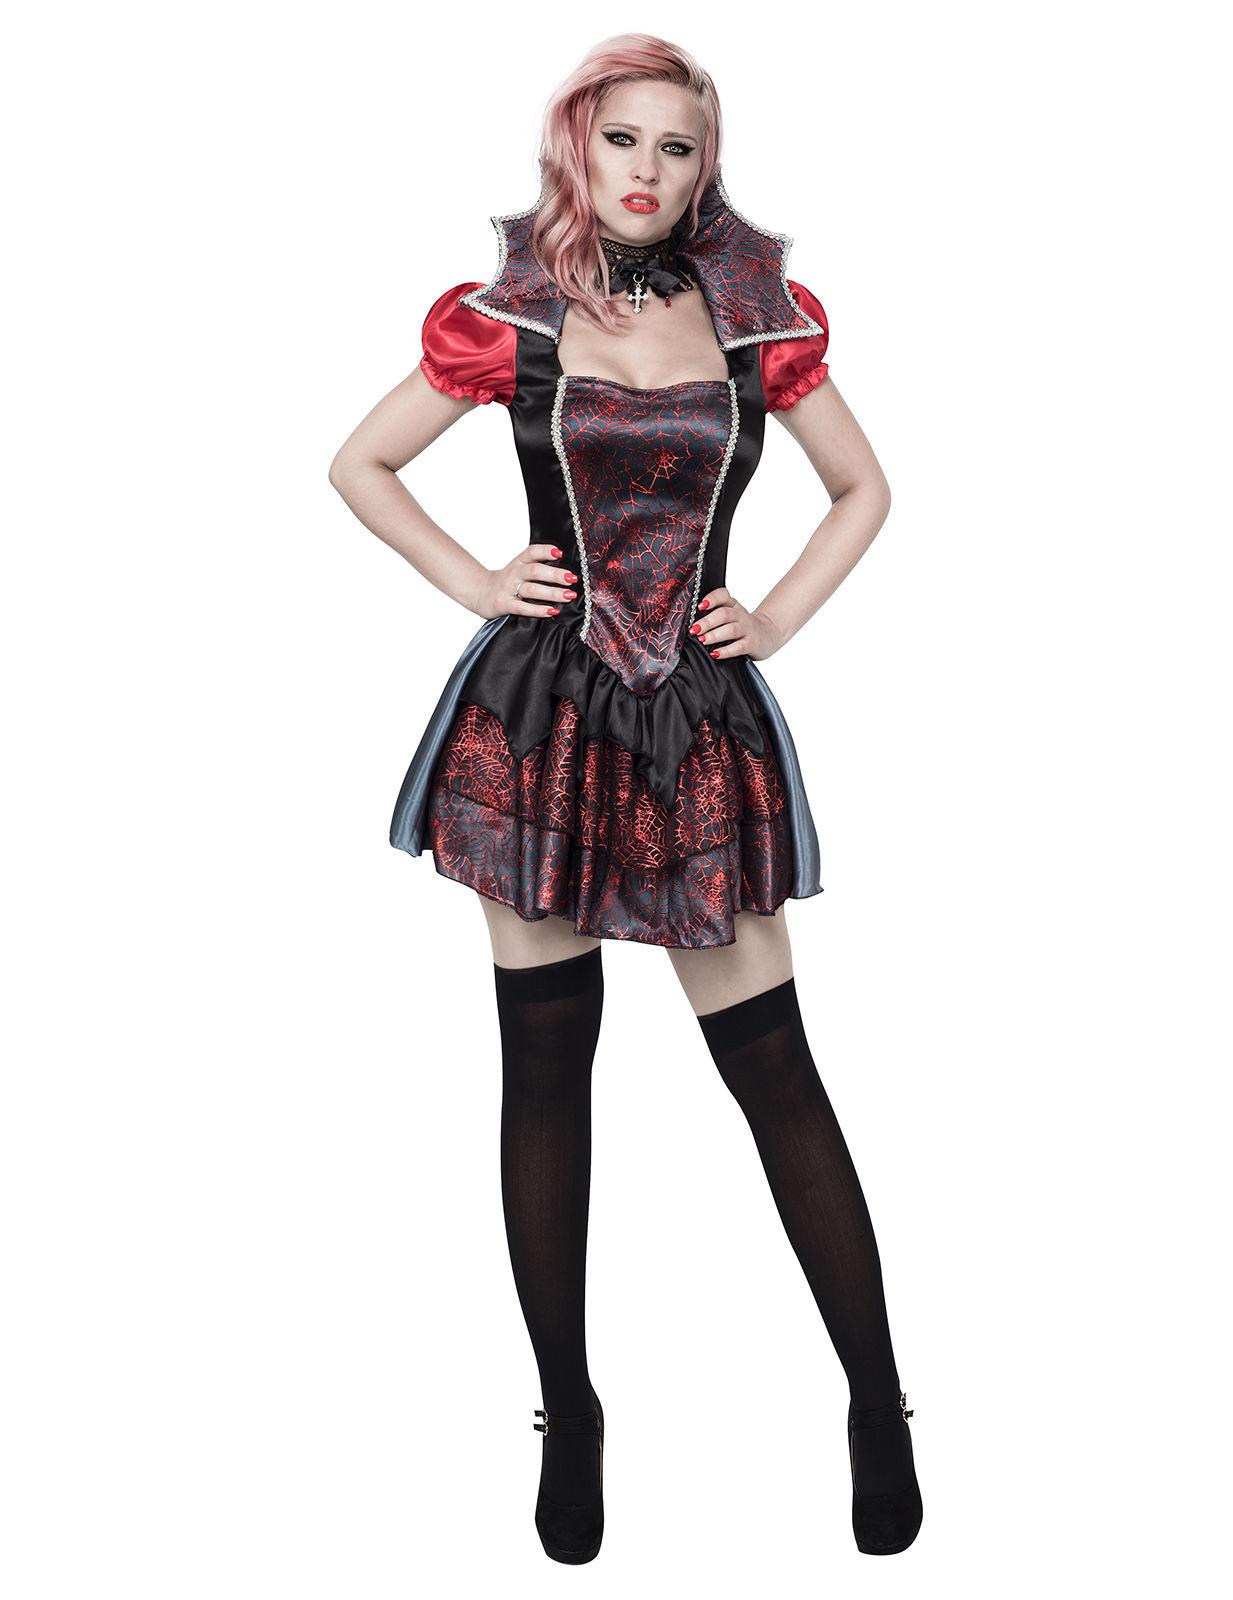 echte Schuhe viel rabatt genießen bieten viel Sexy Barock-Vampirin Halloween-Damenkostüm Spinnen silber-schwarz-rot